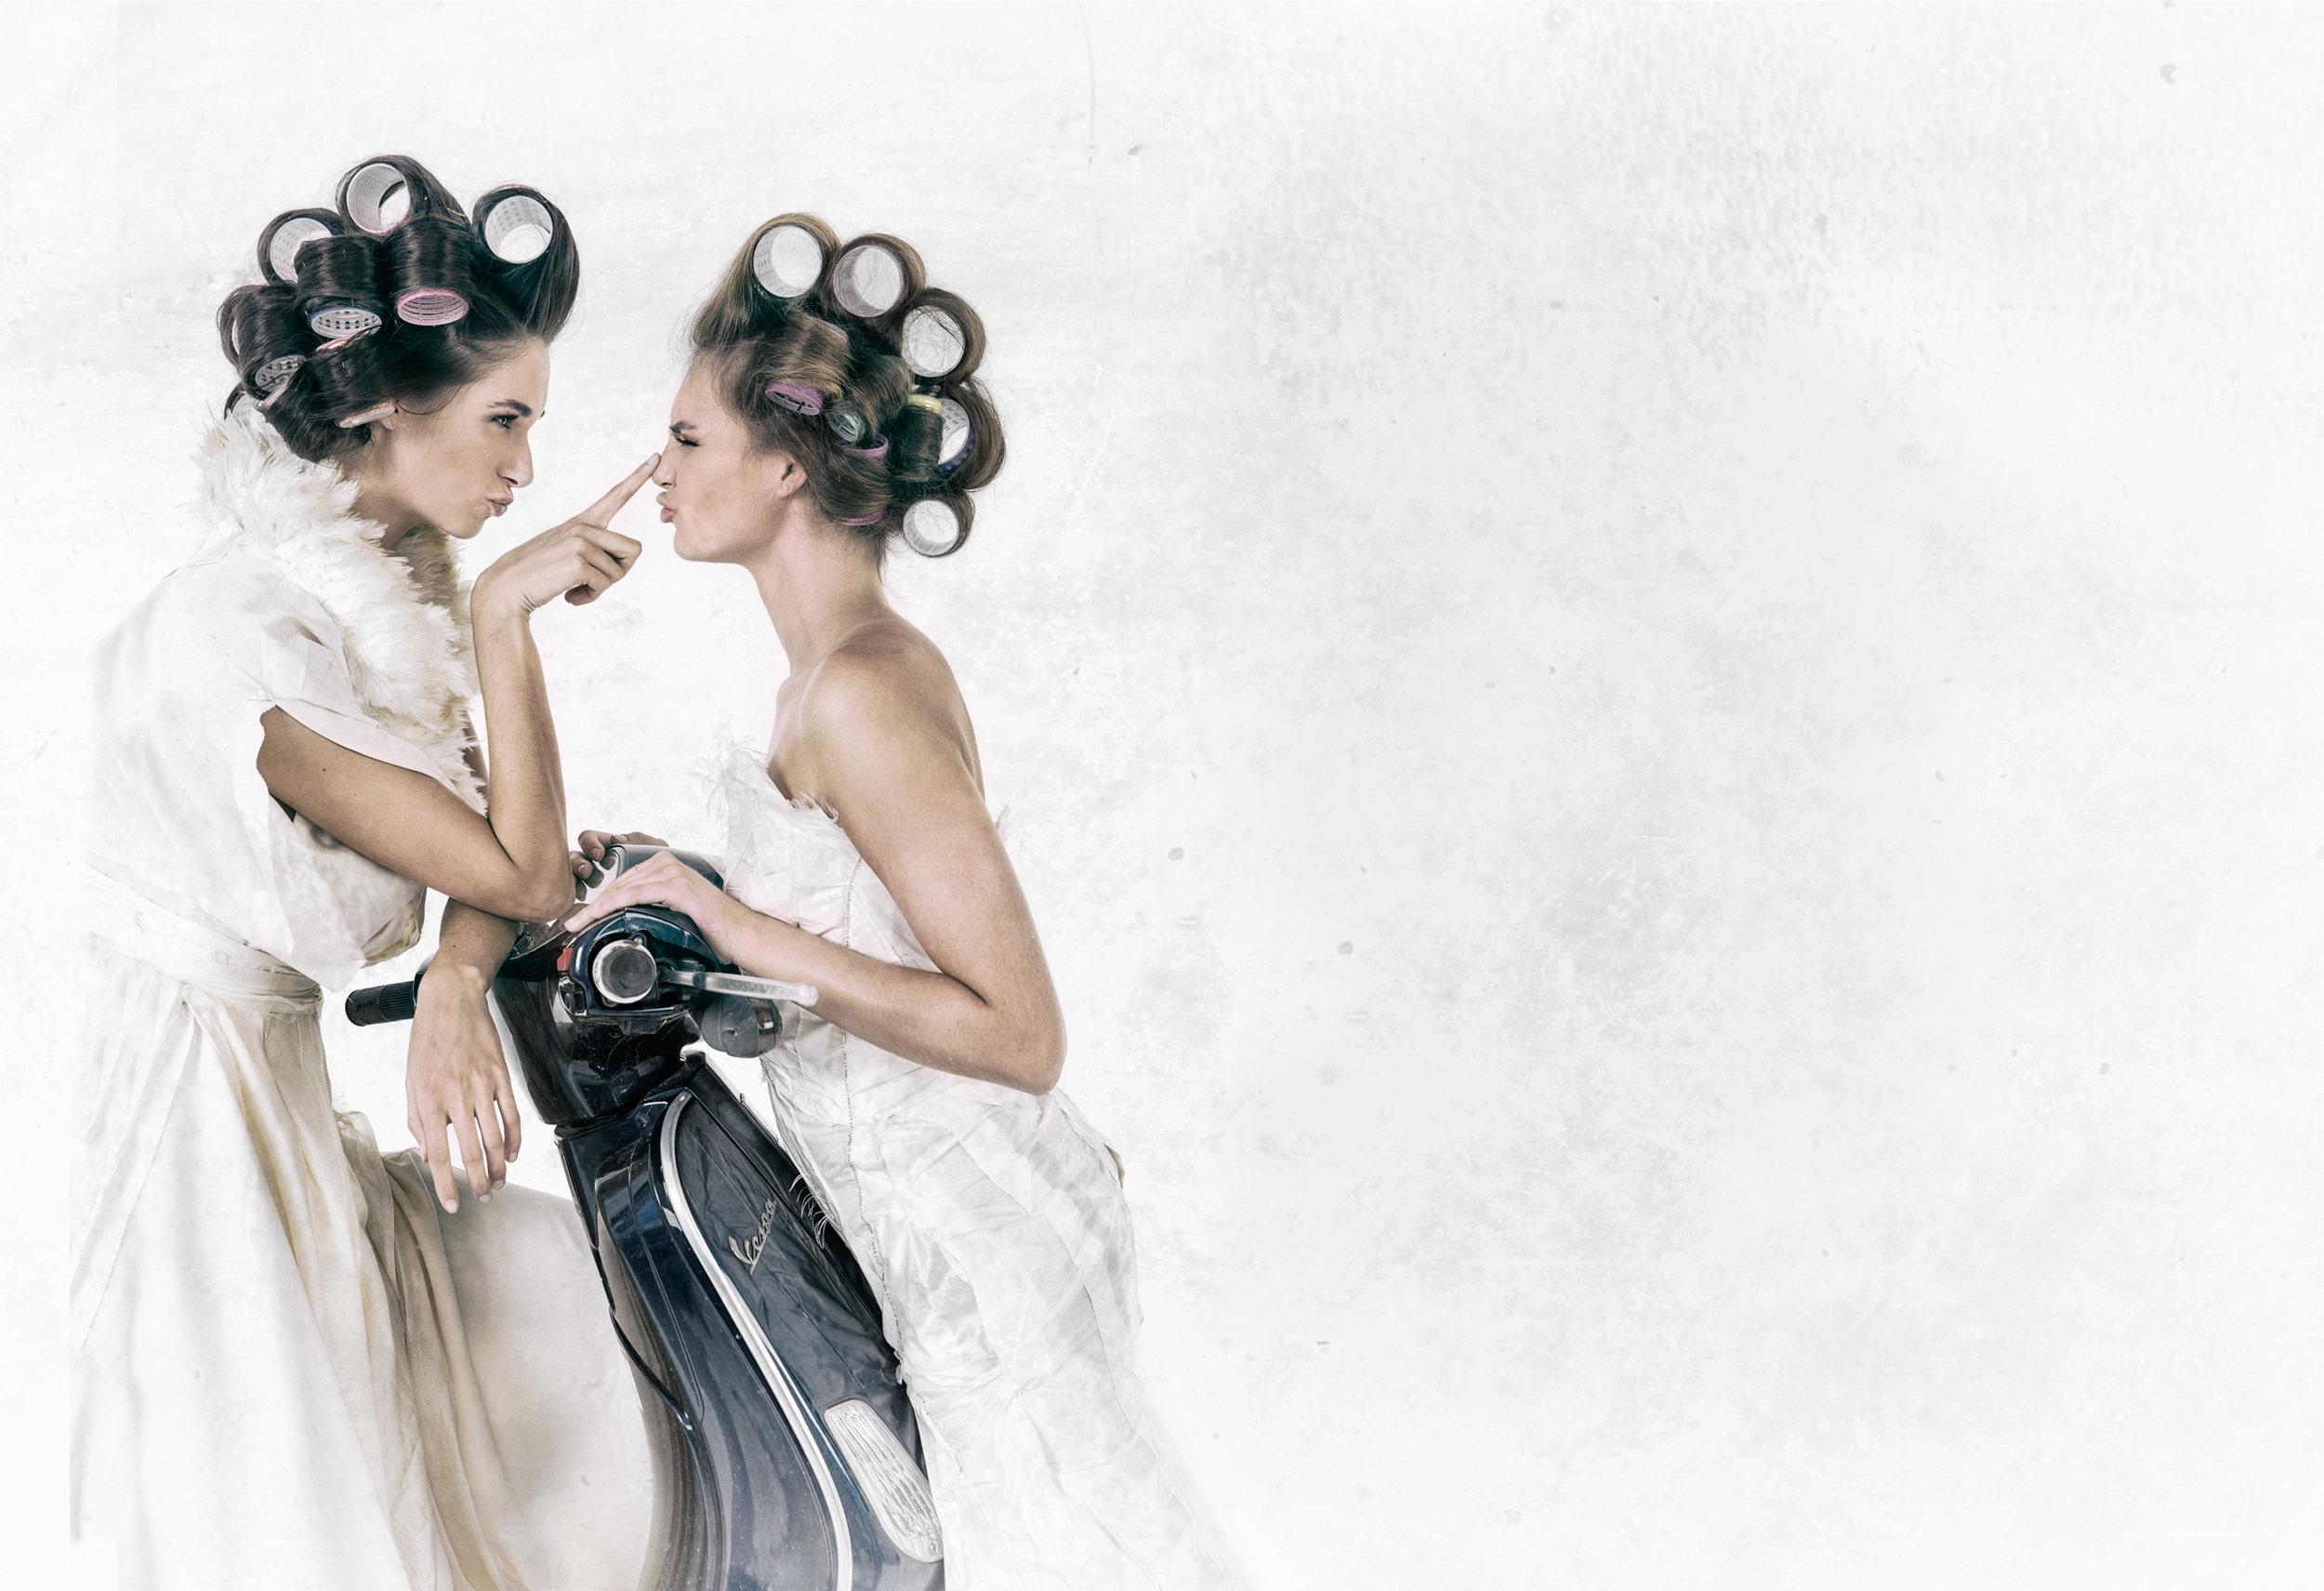 Nicole-P-White-Dresses_01770_13x19_NIK.jpg